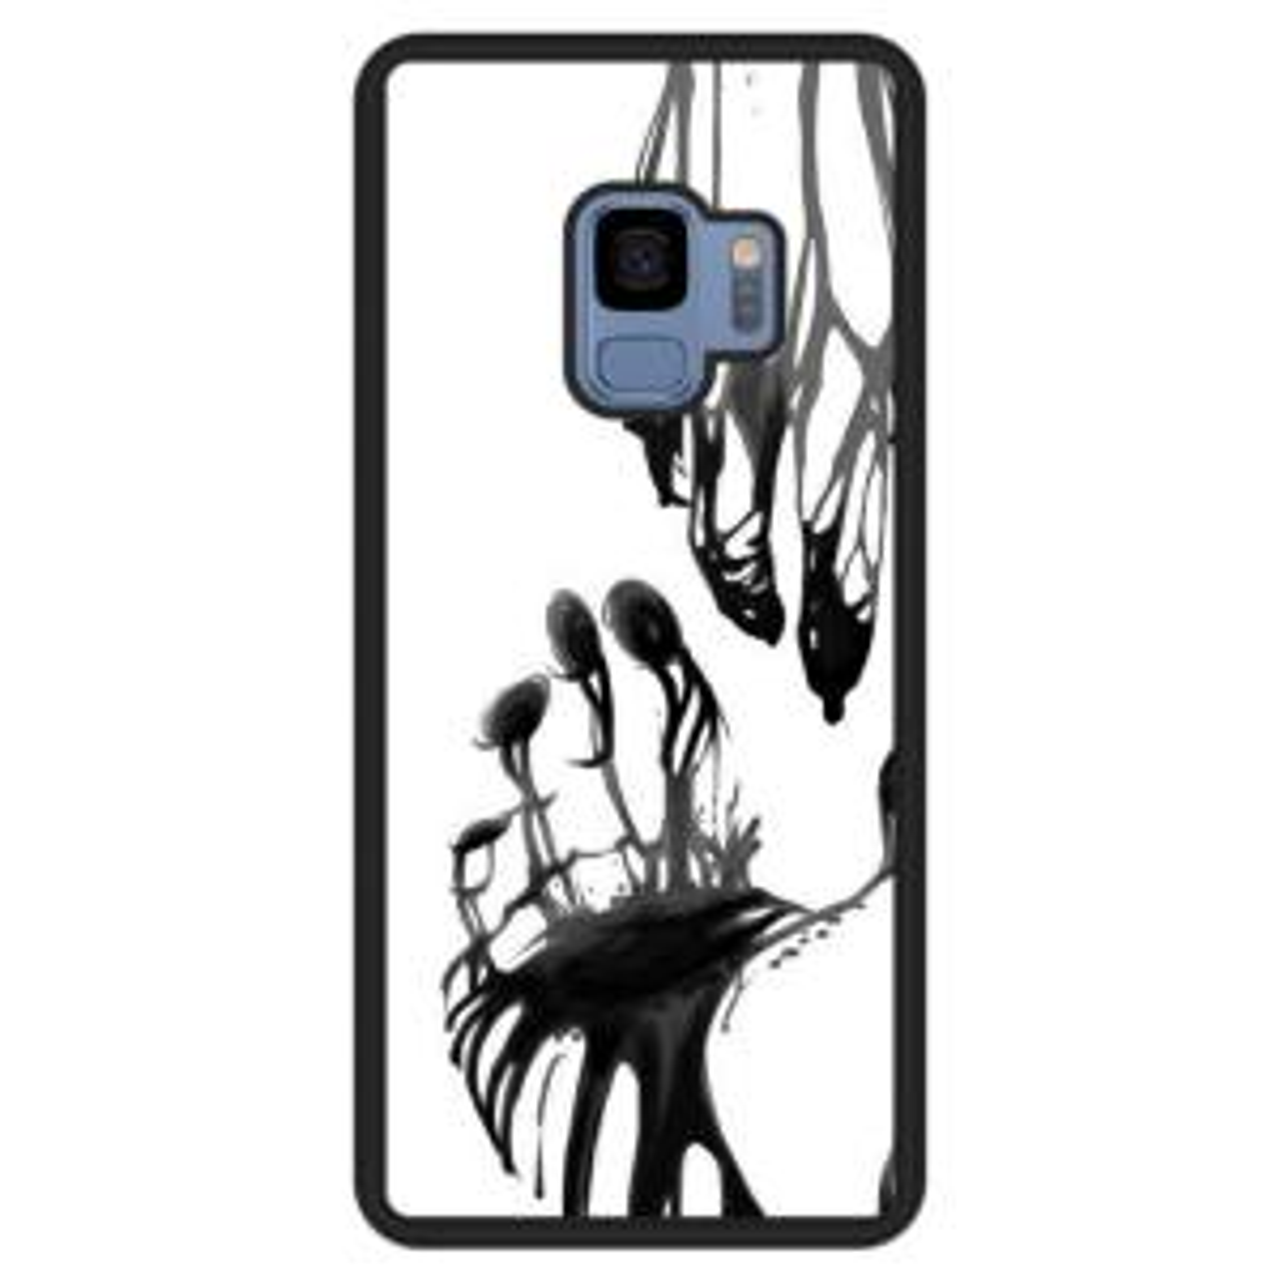 کاور آکام مدل AS90152  مناسب برای گوشی موبایل سامسونگ گلکسی اس 9